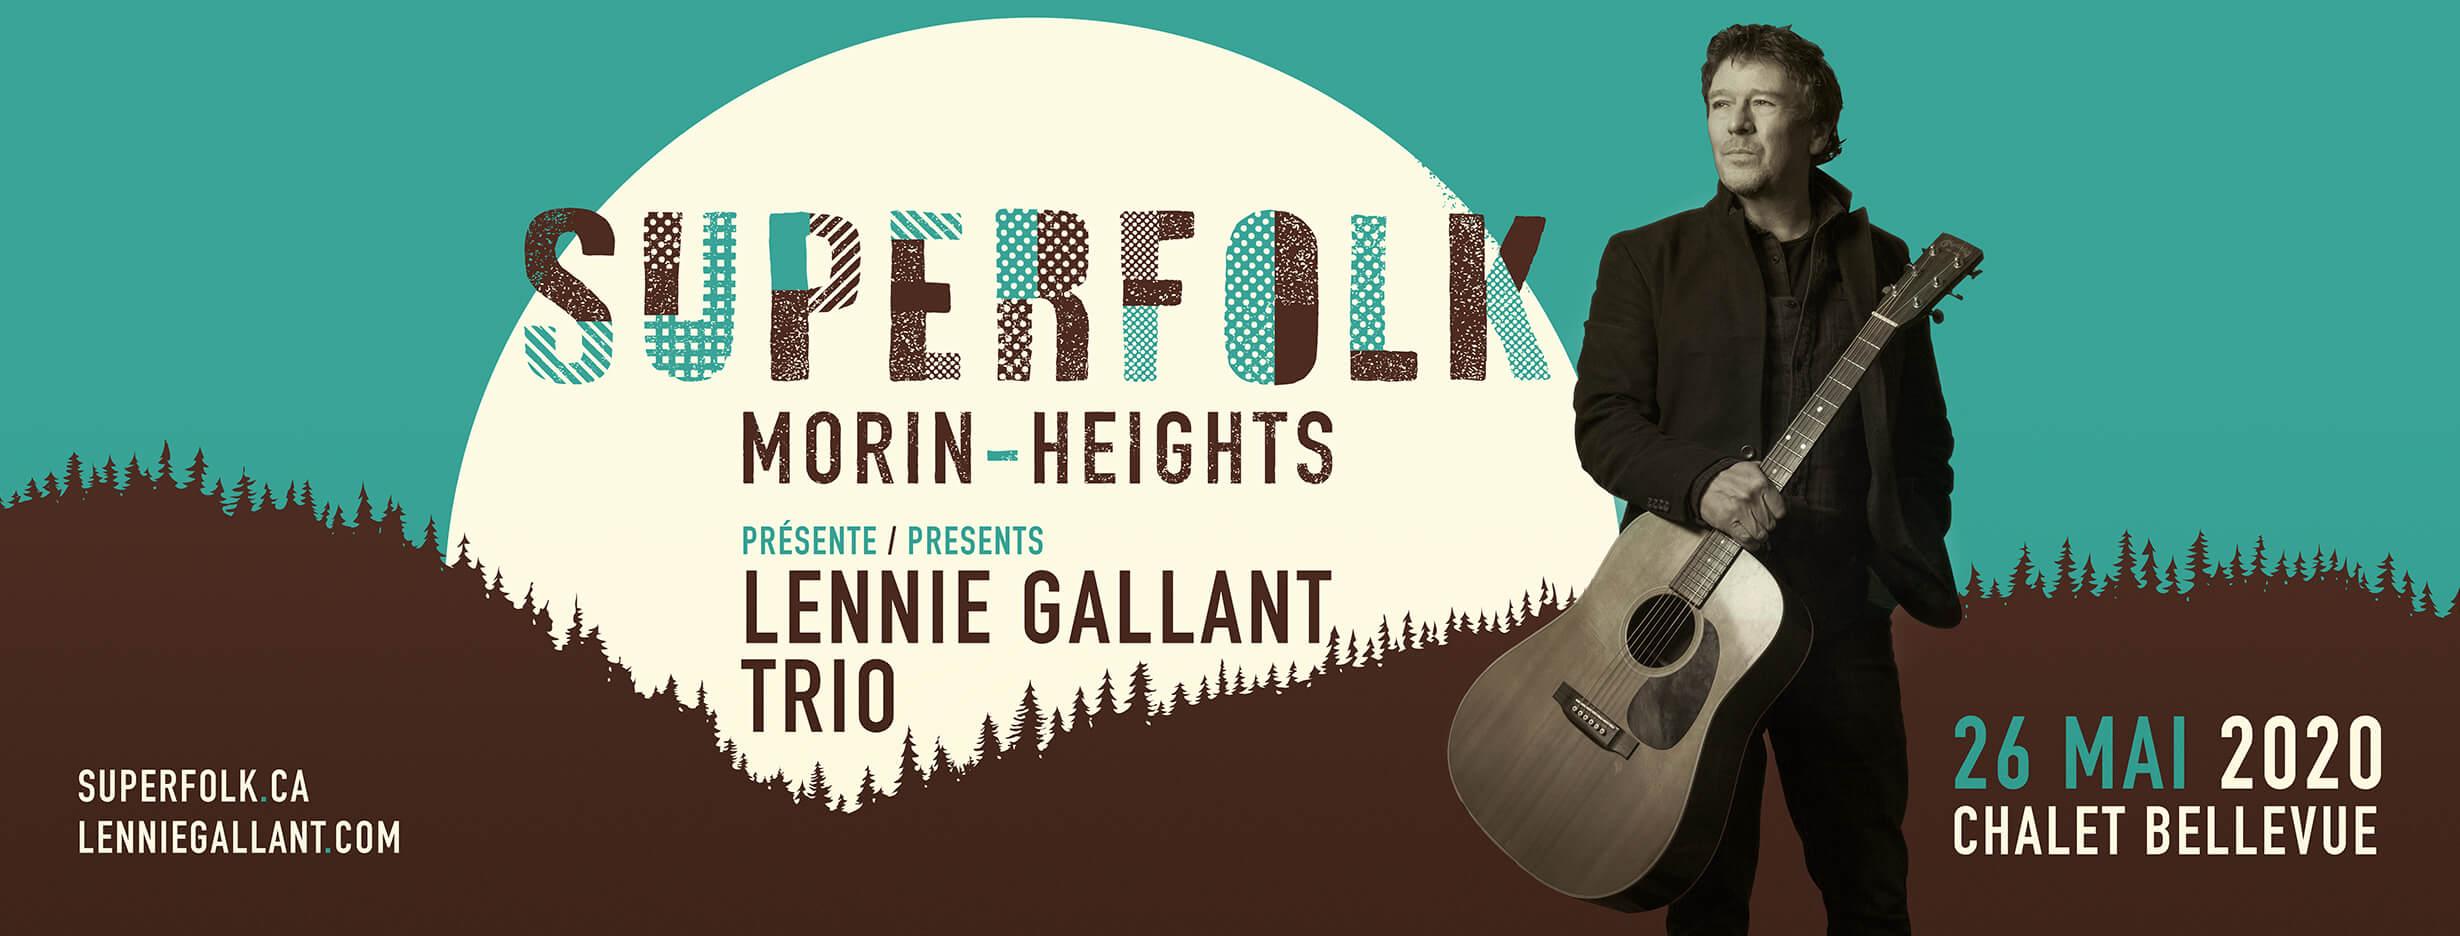 SuperFolk présente Lennie Gallant Trio - SuperFolk presents Lennie Gallant Trio